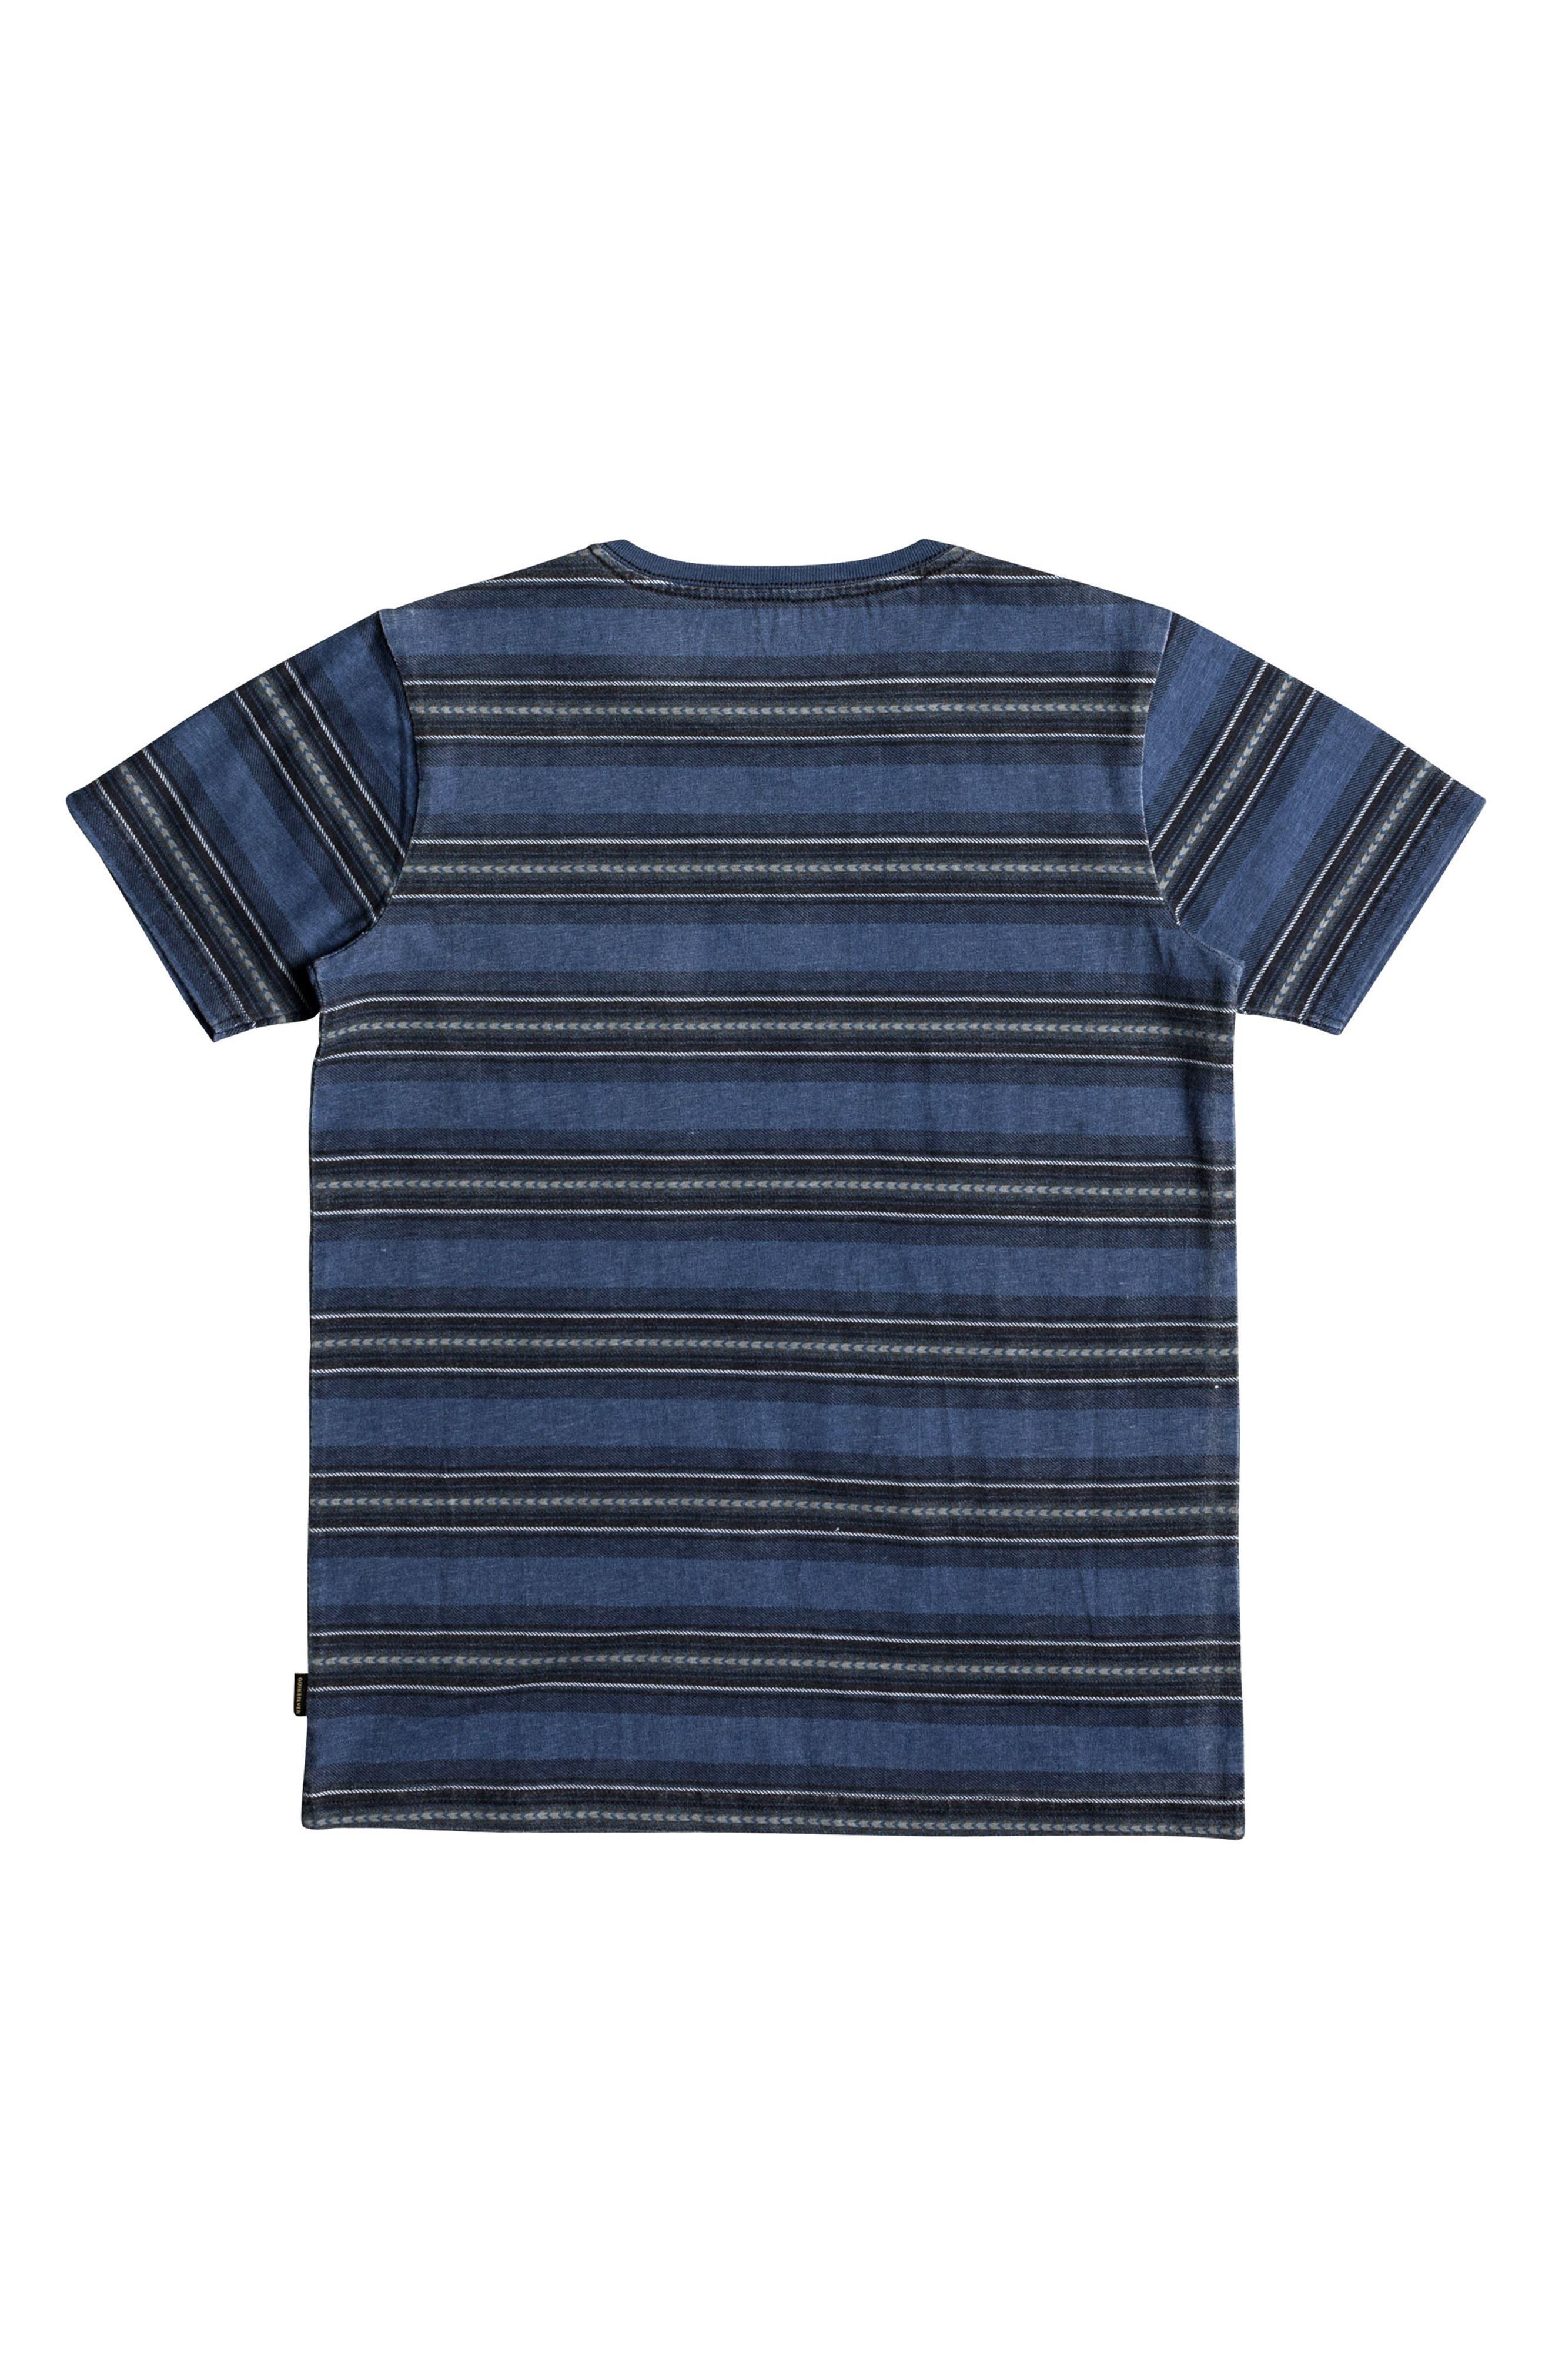 Alternate Image 2  - Quiksilver Bayo Pocket T-Shirt (Big Boys)